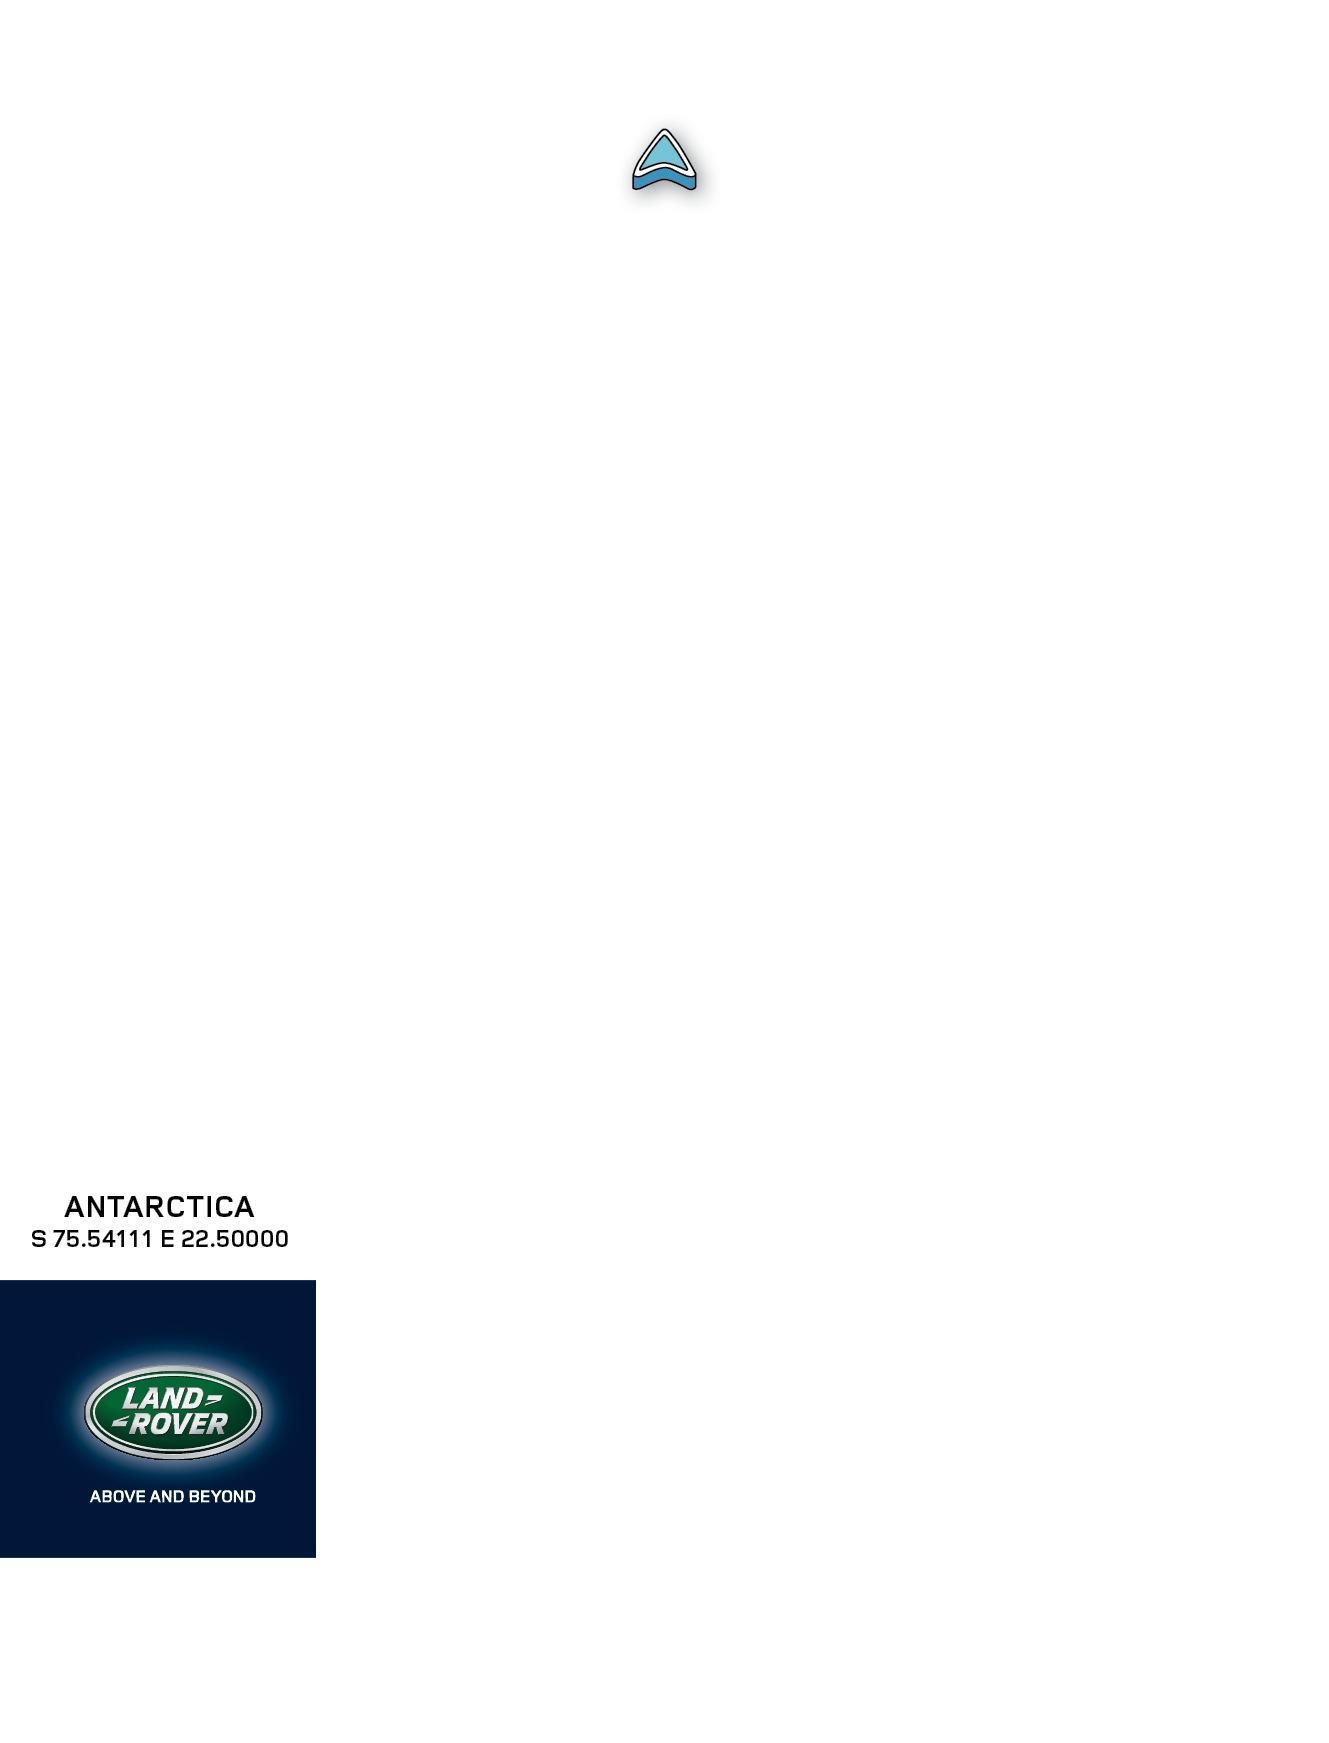 Land Rover Print Ad -  Antarctica